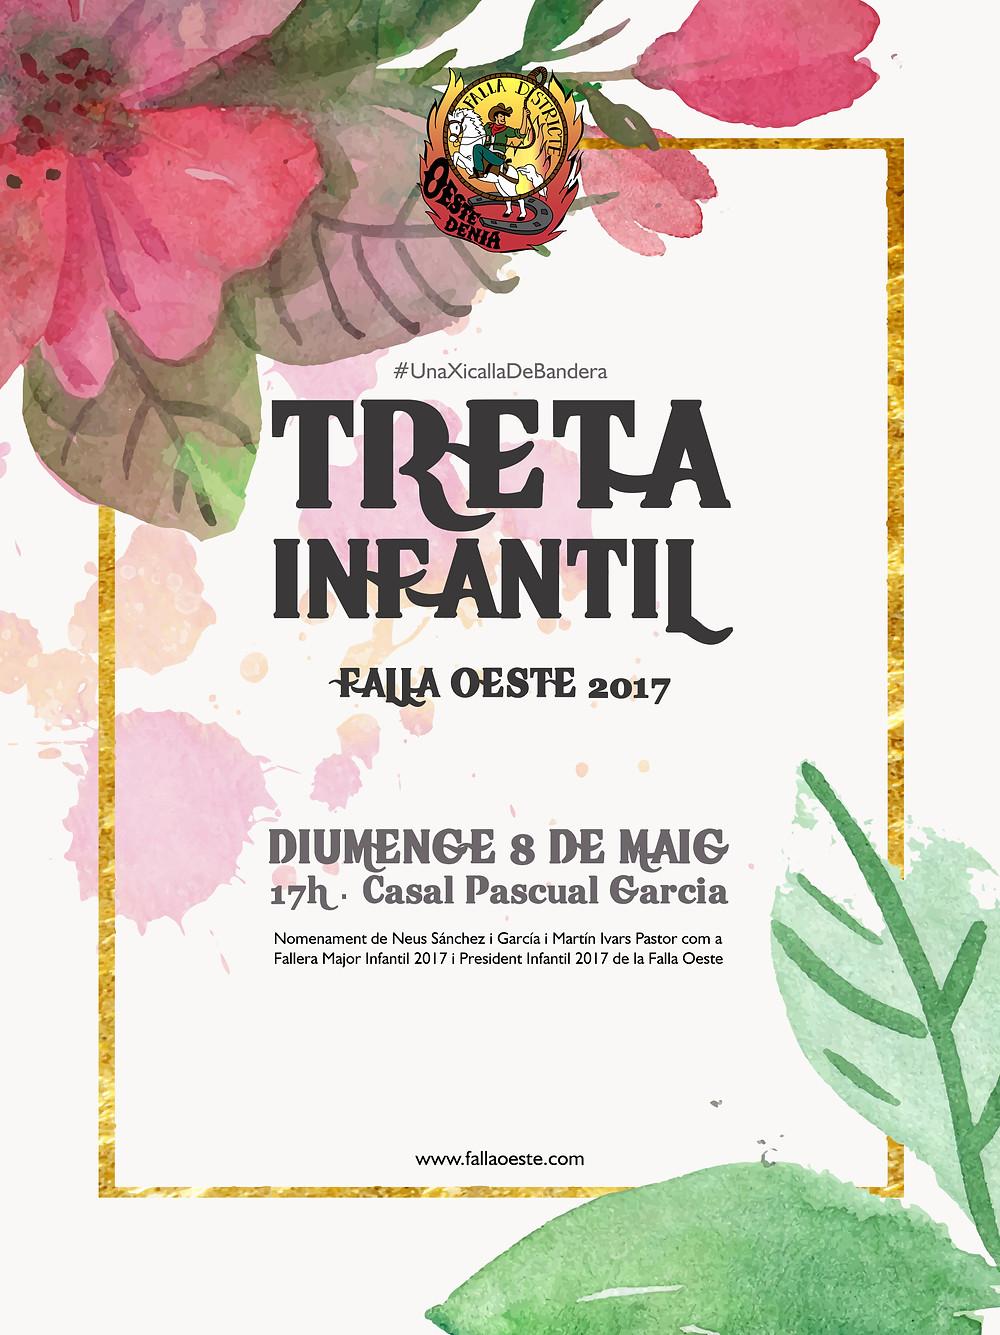 Treta Infantil 2017